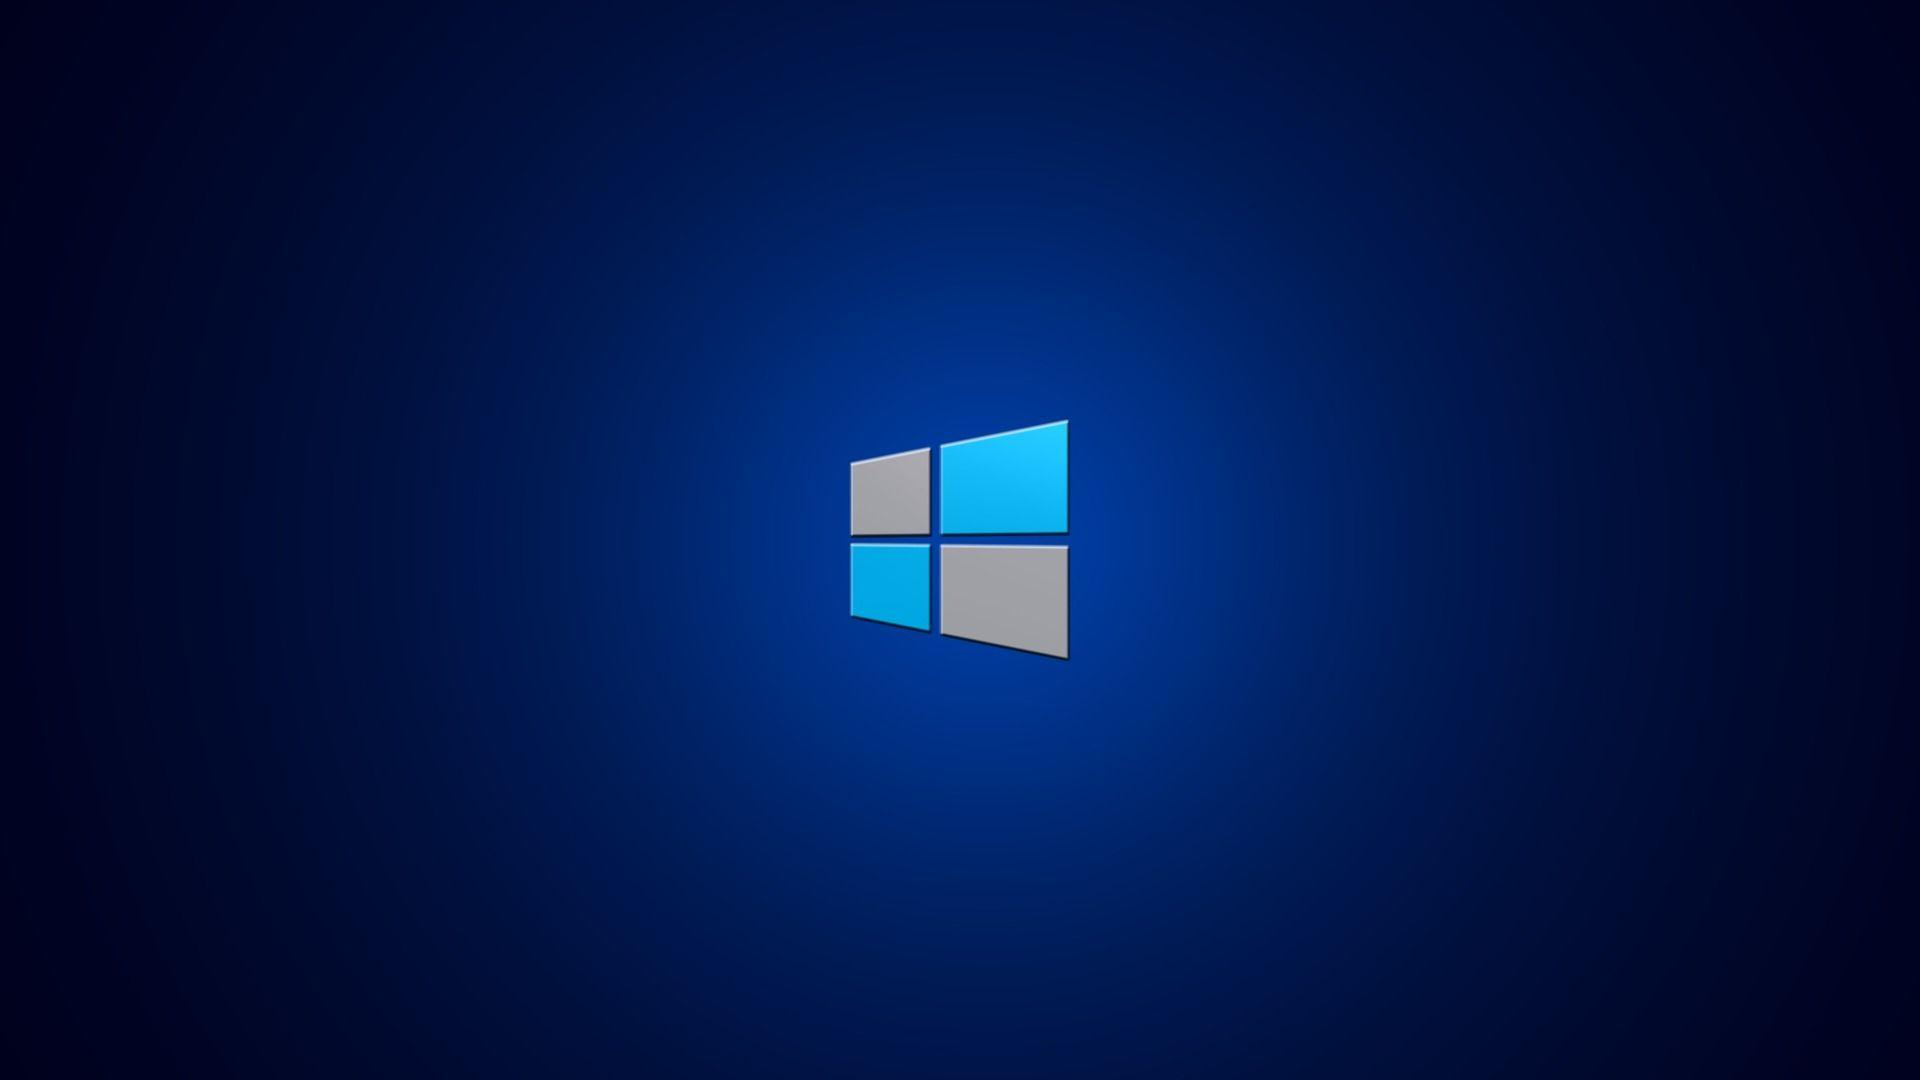 Windows 8 Wallpaper Hd 1080P Free Download